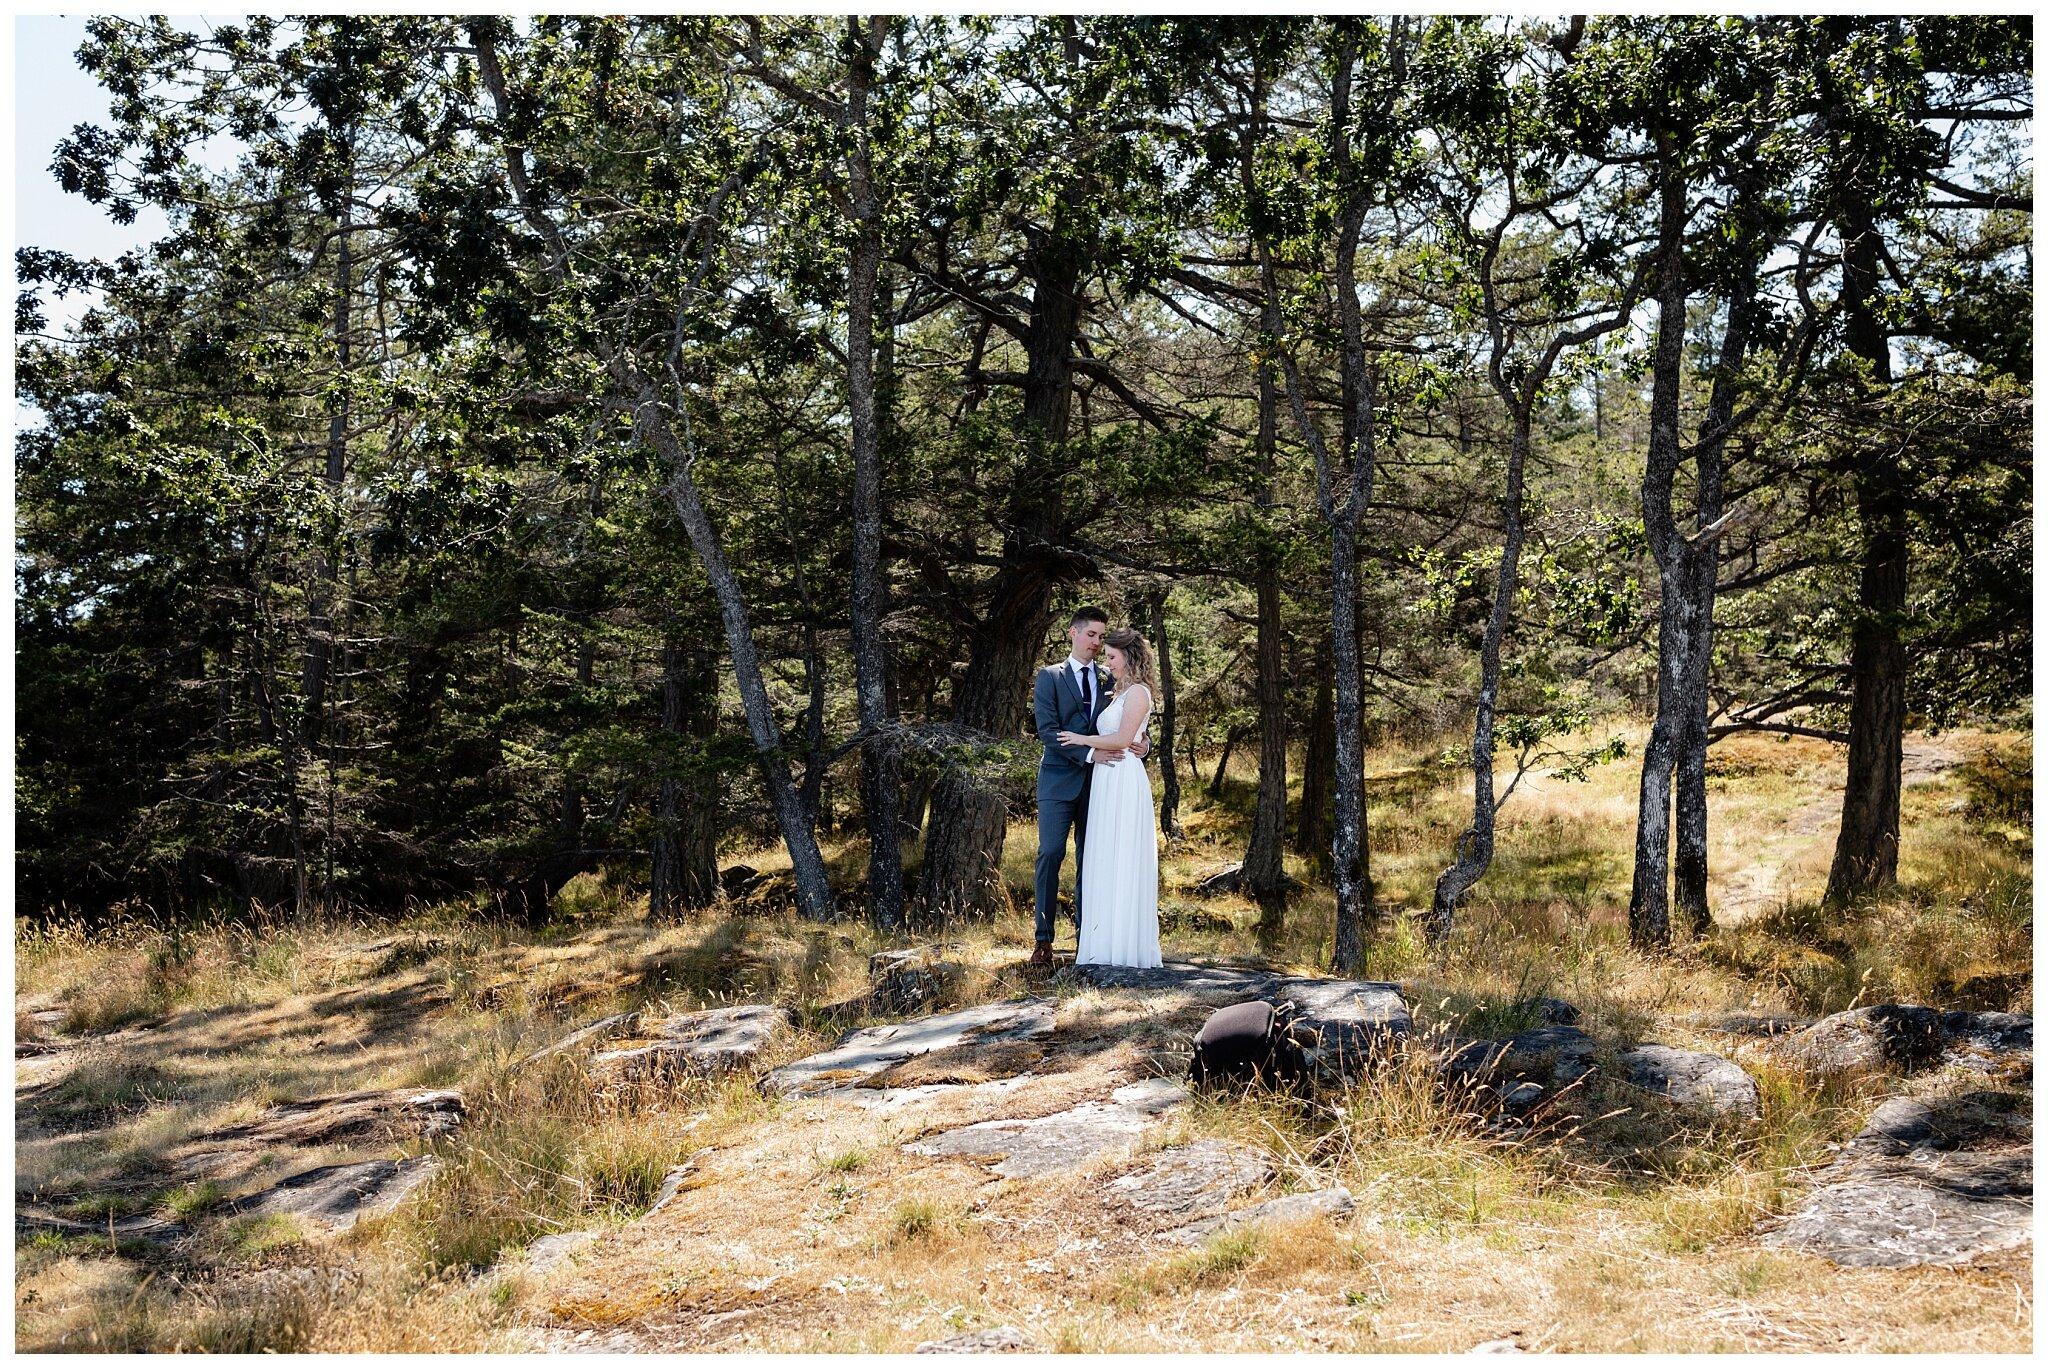 Salt Spring Island Wedding Photographer Destination Wedding Ruckle Provincial Park_0007.jpg